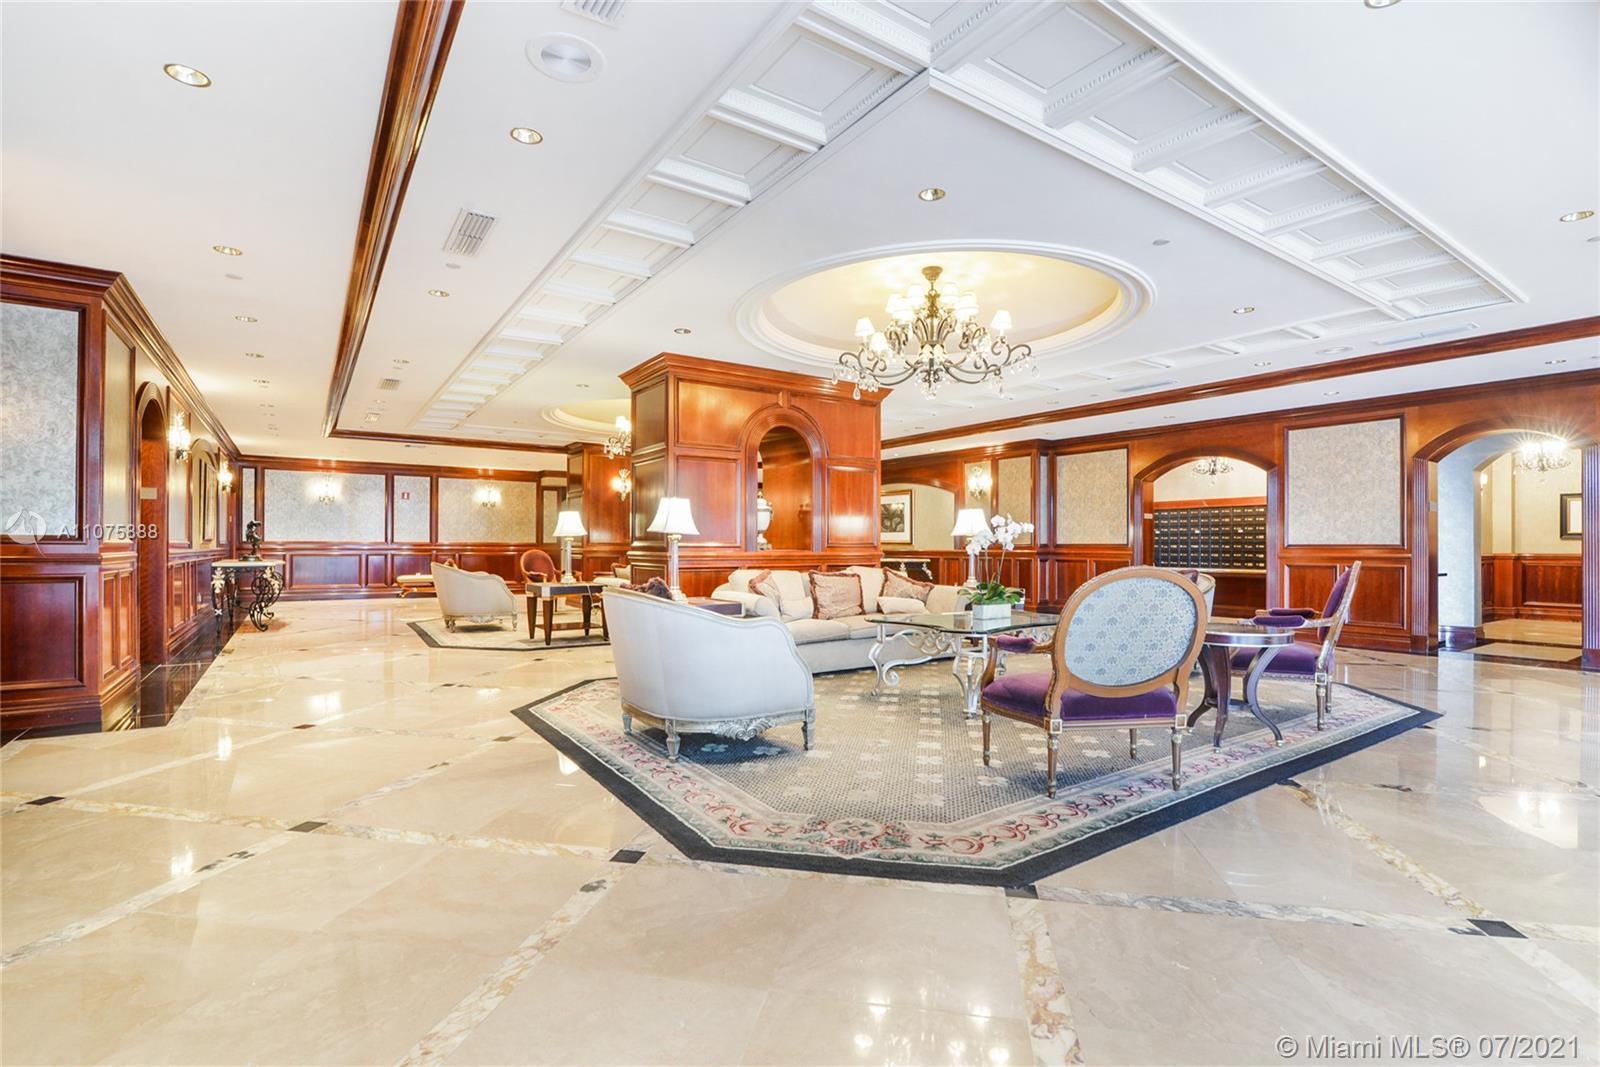 PERFECT FOR INVESTOR-TENANT IN PLACE TILL JUNE 28, 2022. Beautiful 1 bedroom+ den, Luxury Oceanfront